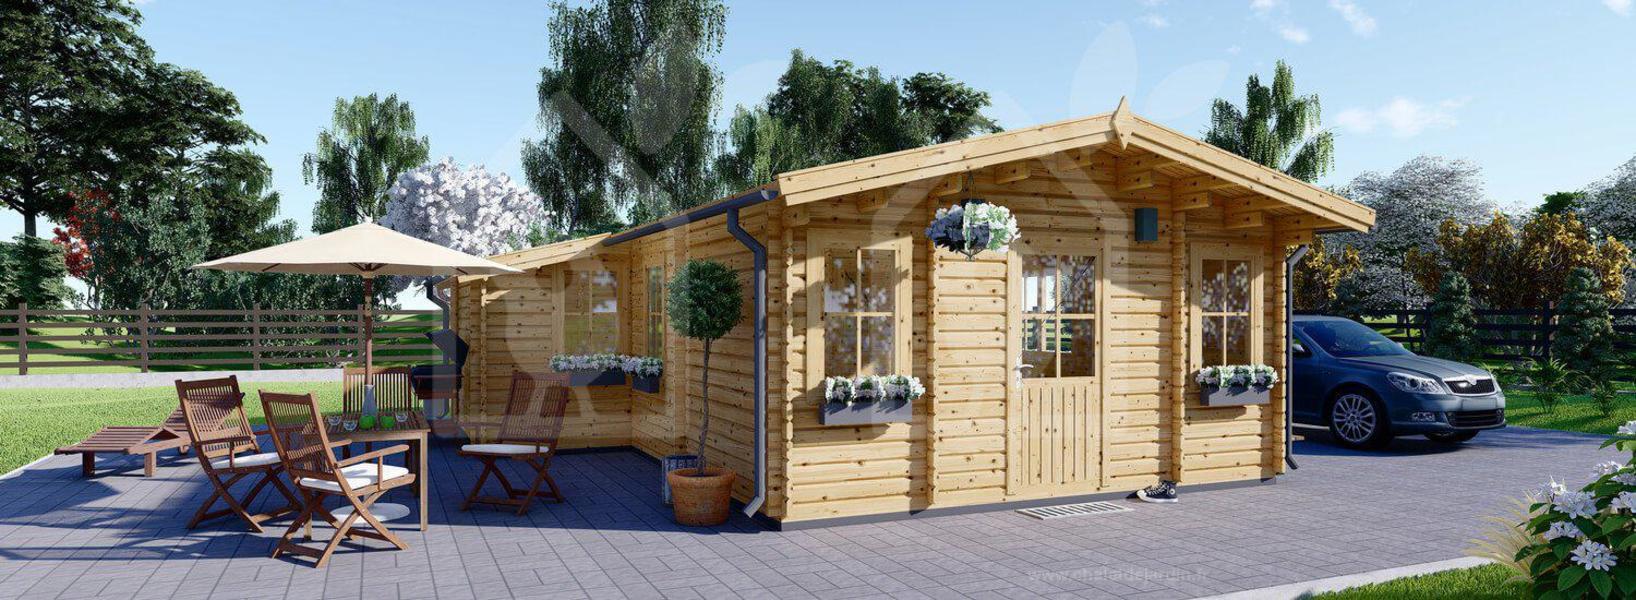 Luxury log cabin with sanitary facilities